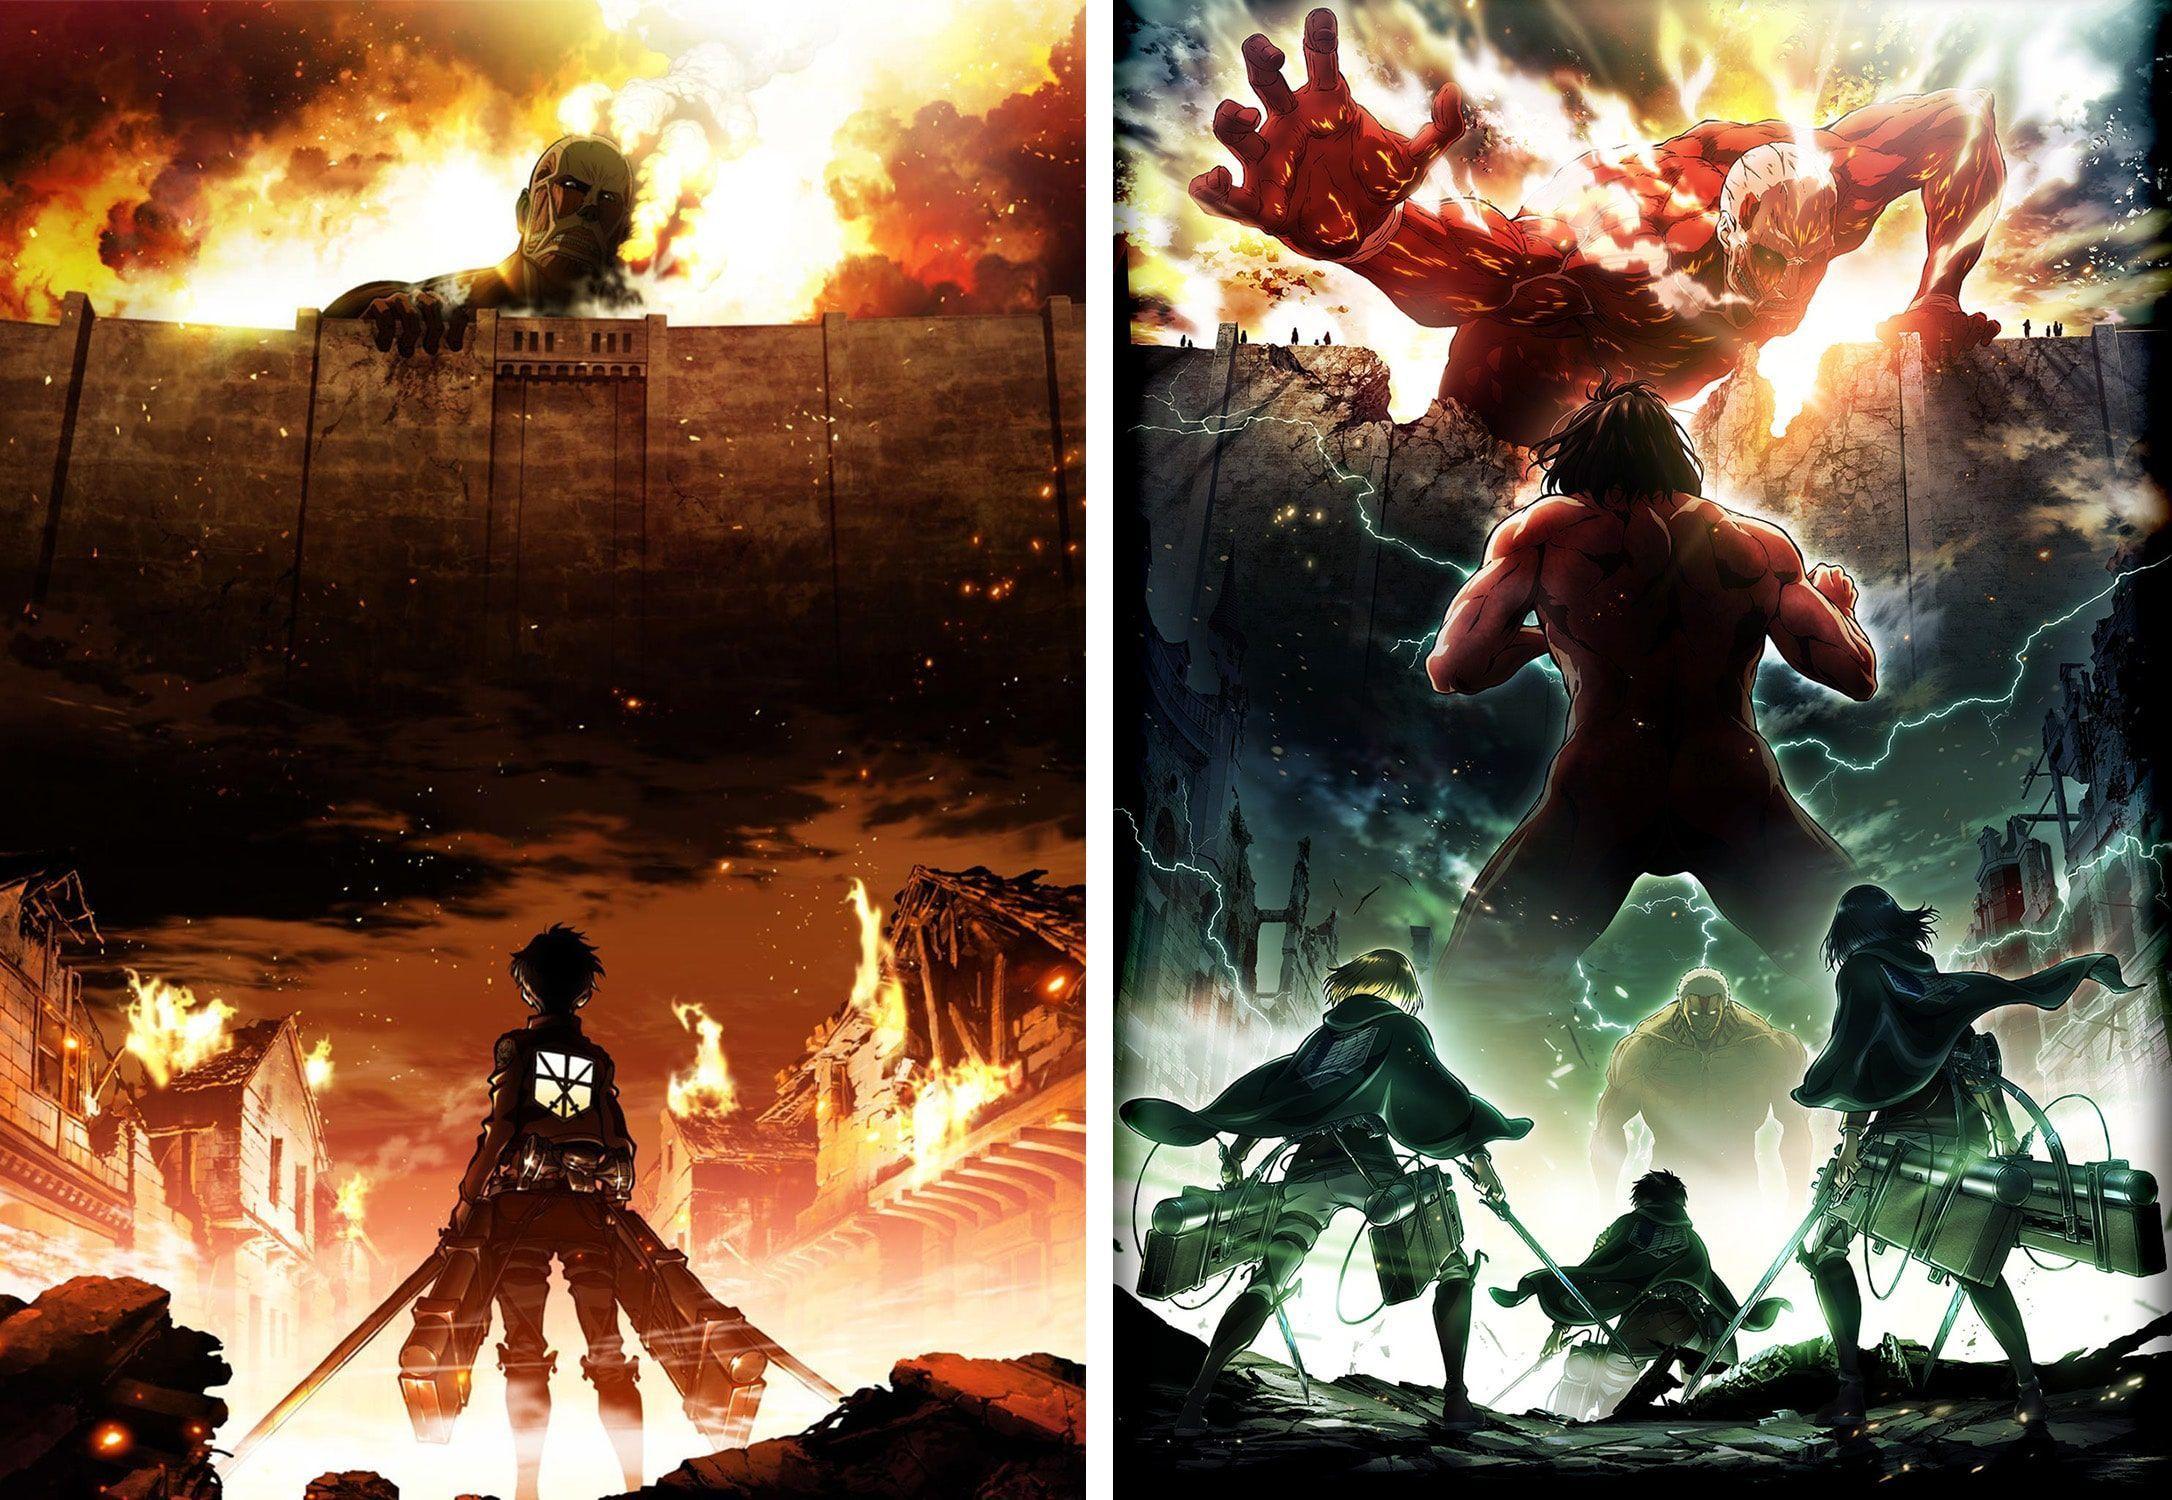 Attack on titan season 1 and 2 attack on titan season